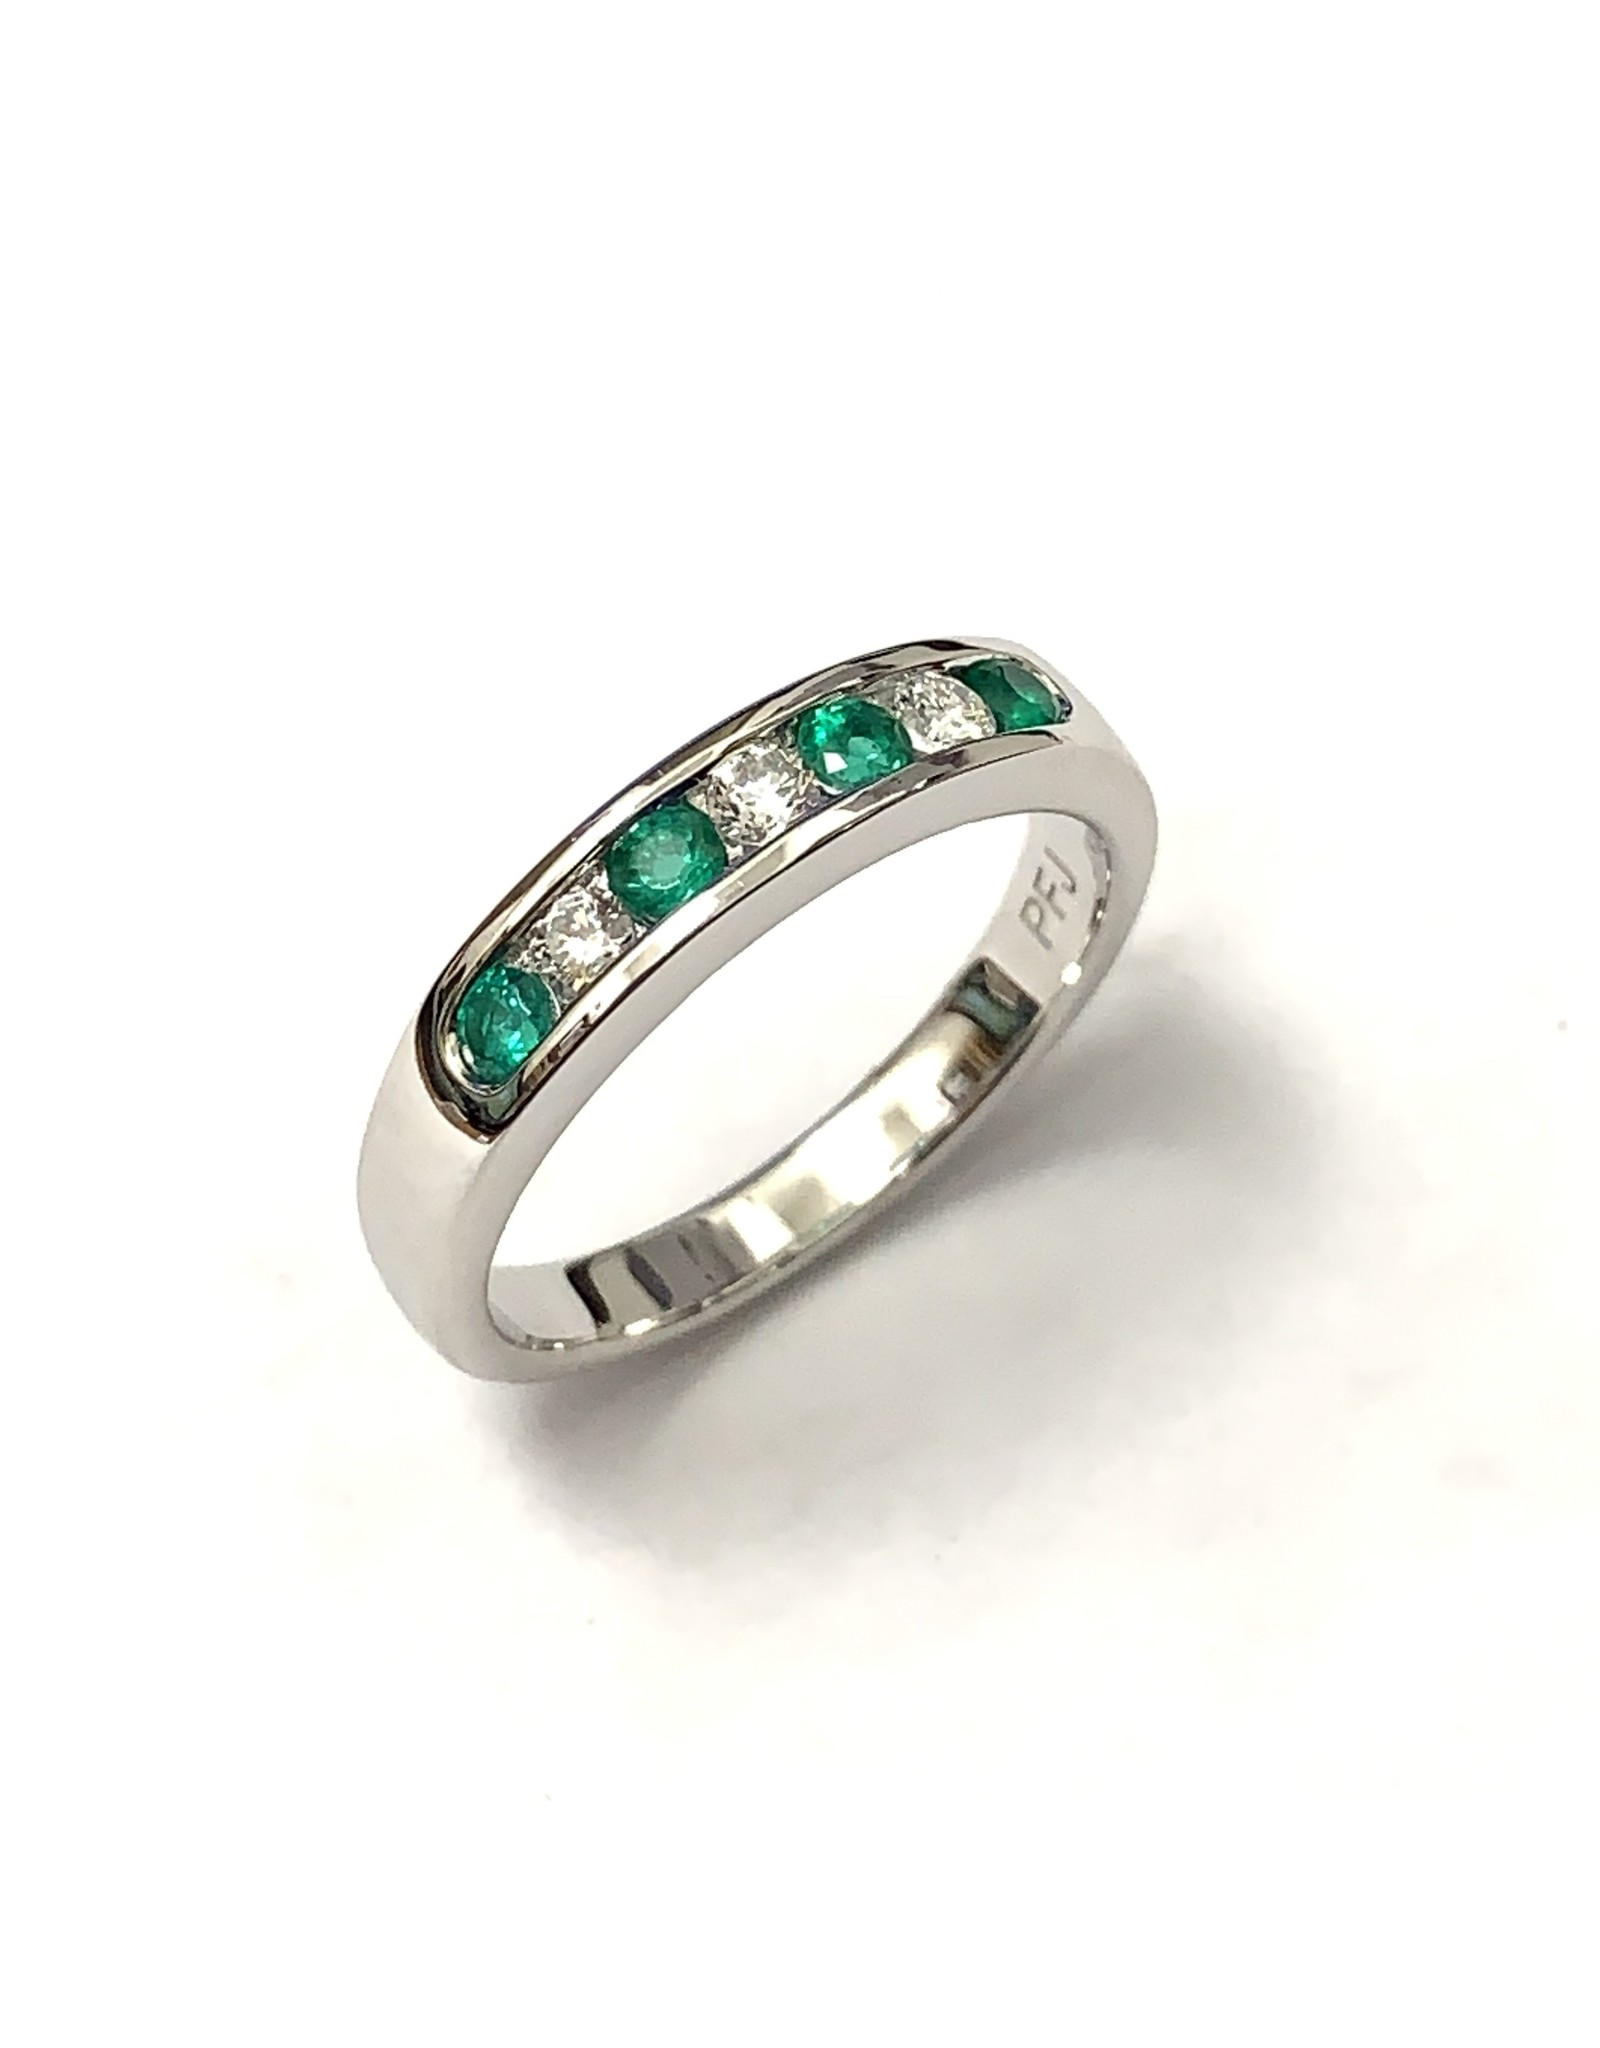 Emerald & Diamond Channel Set Ring 18KW